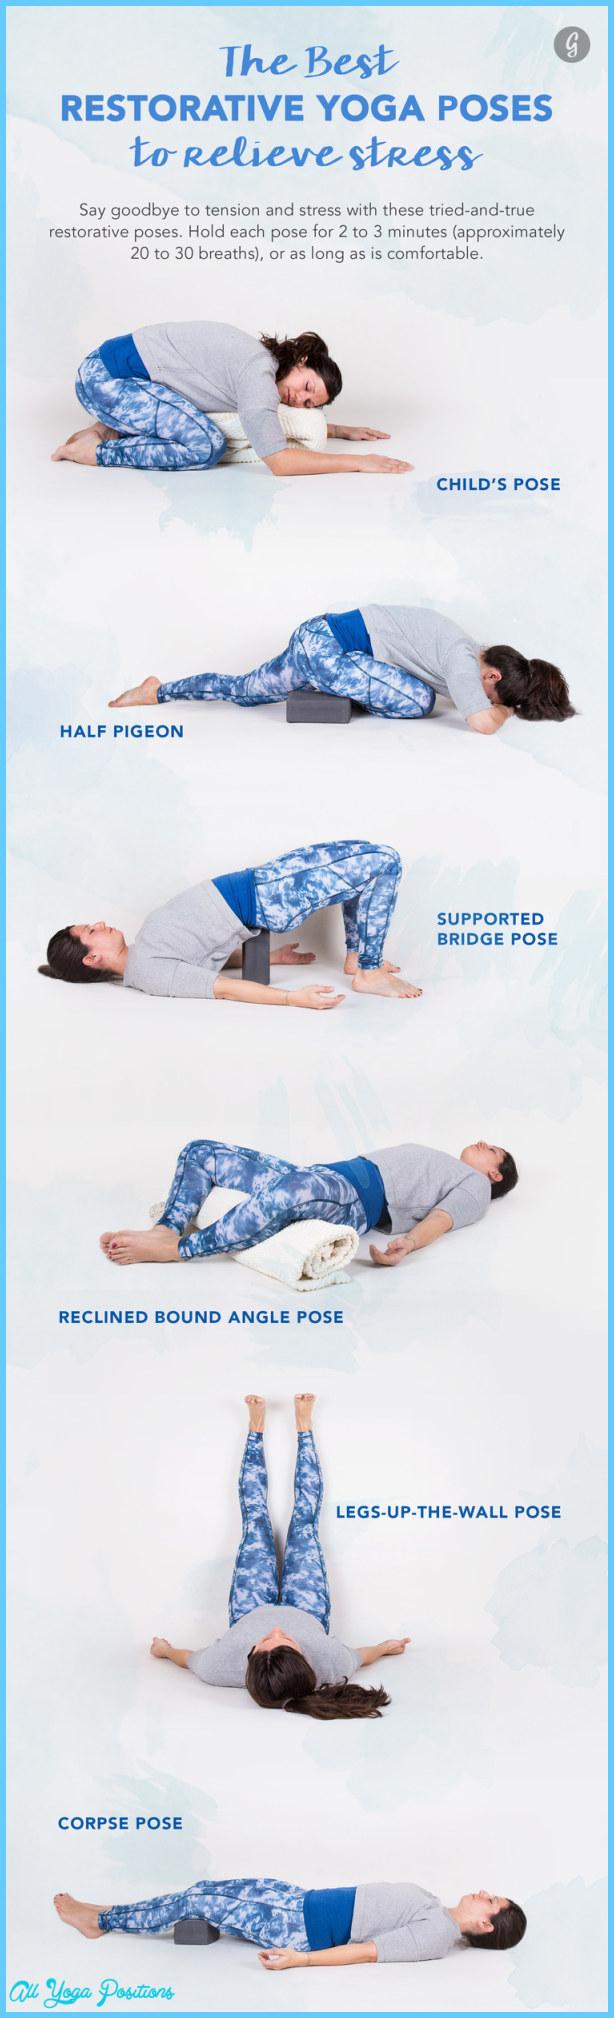 Yoga poses restorative  _5.jpg